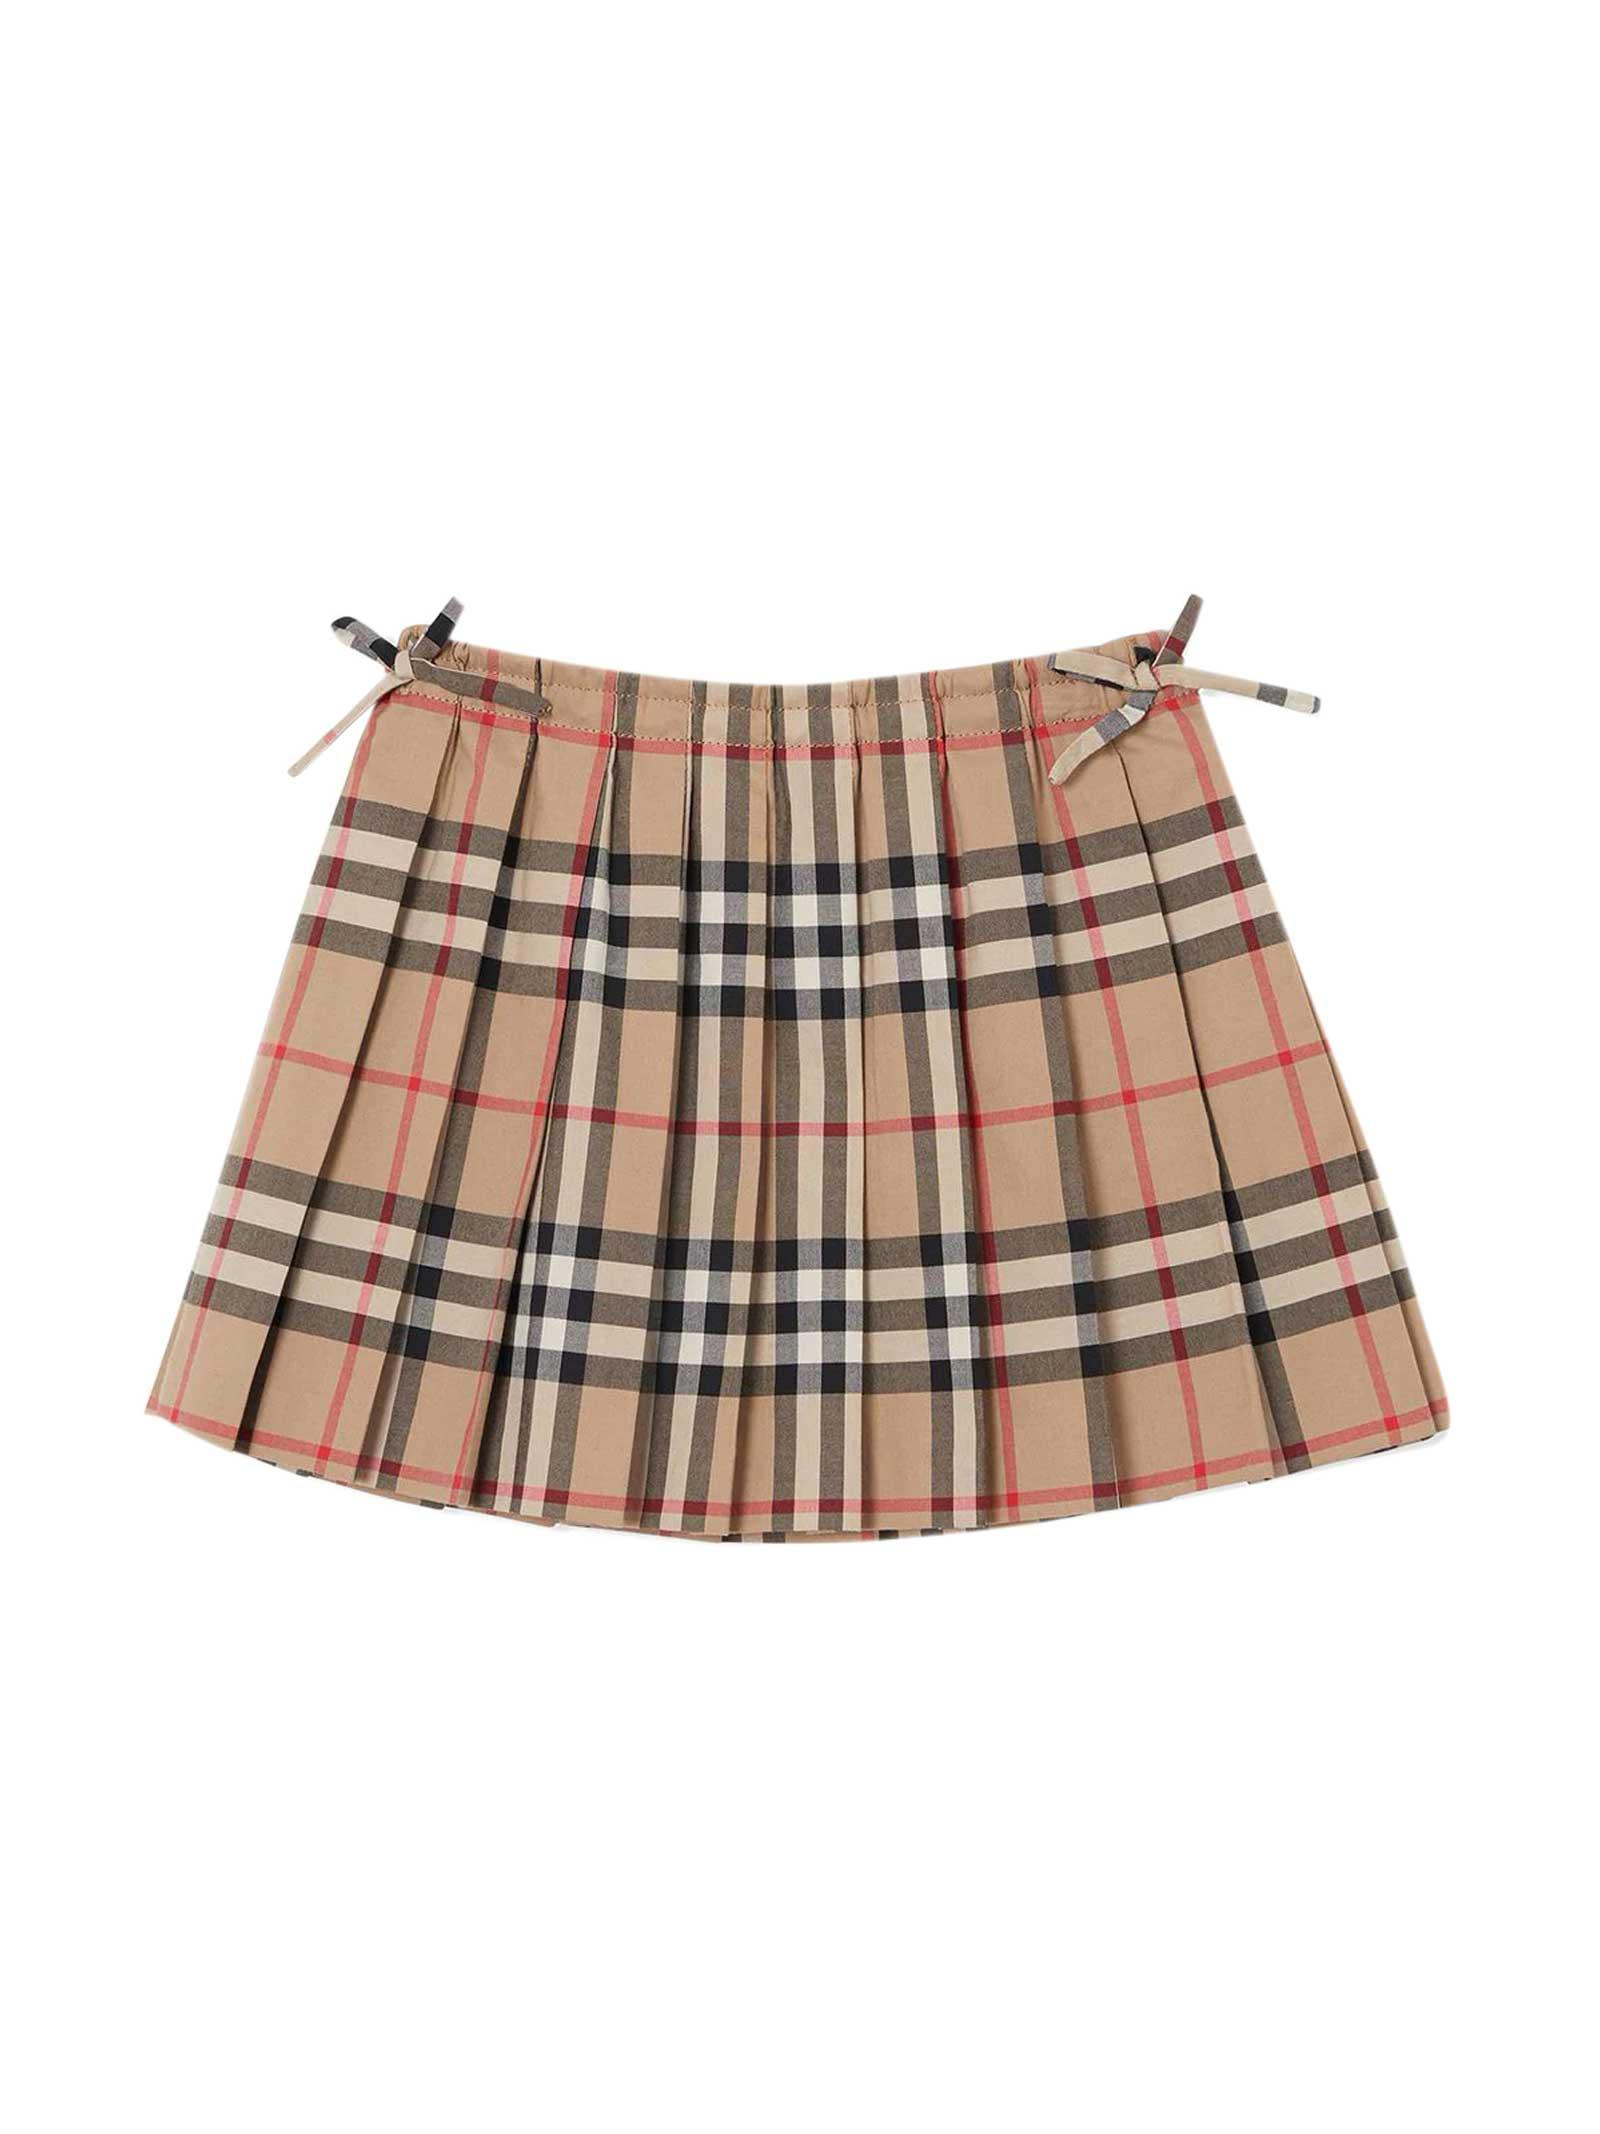 Burberry Babies' Beige Skirt